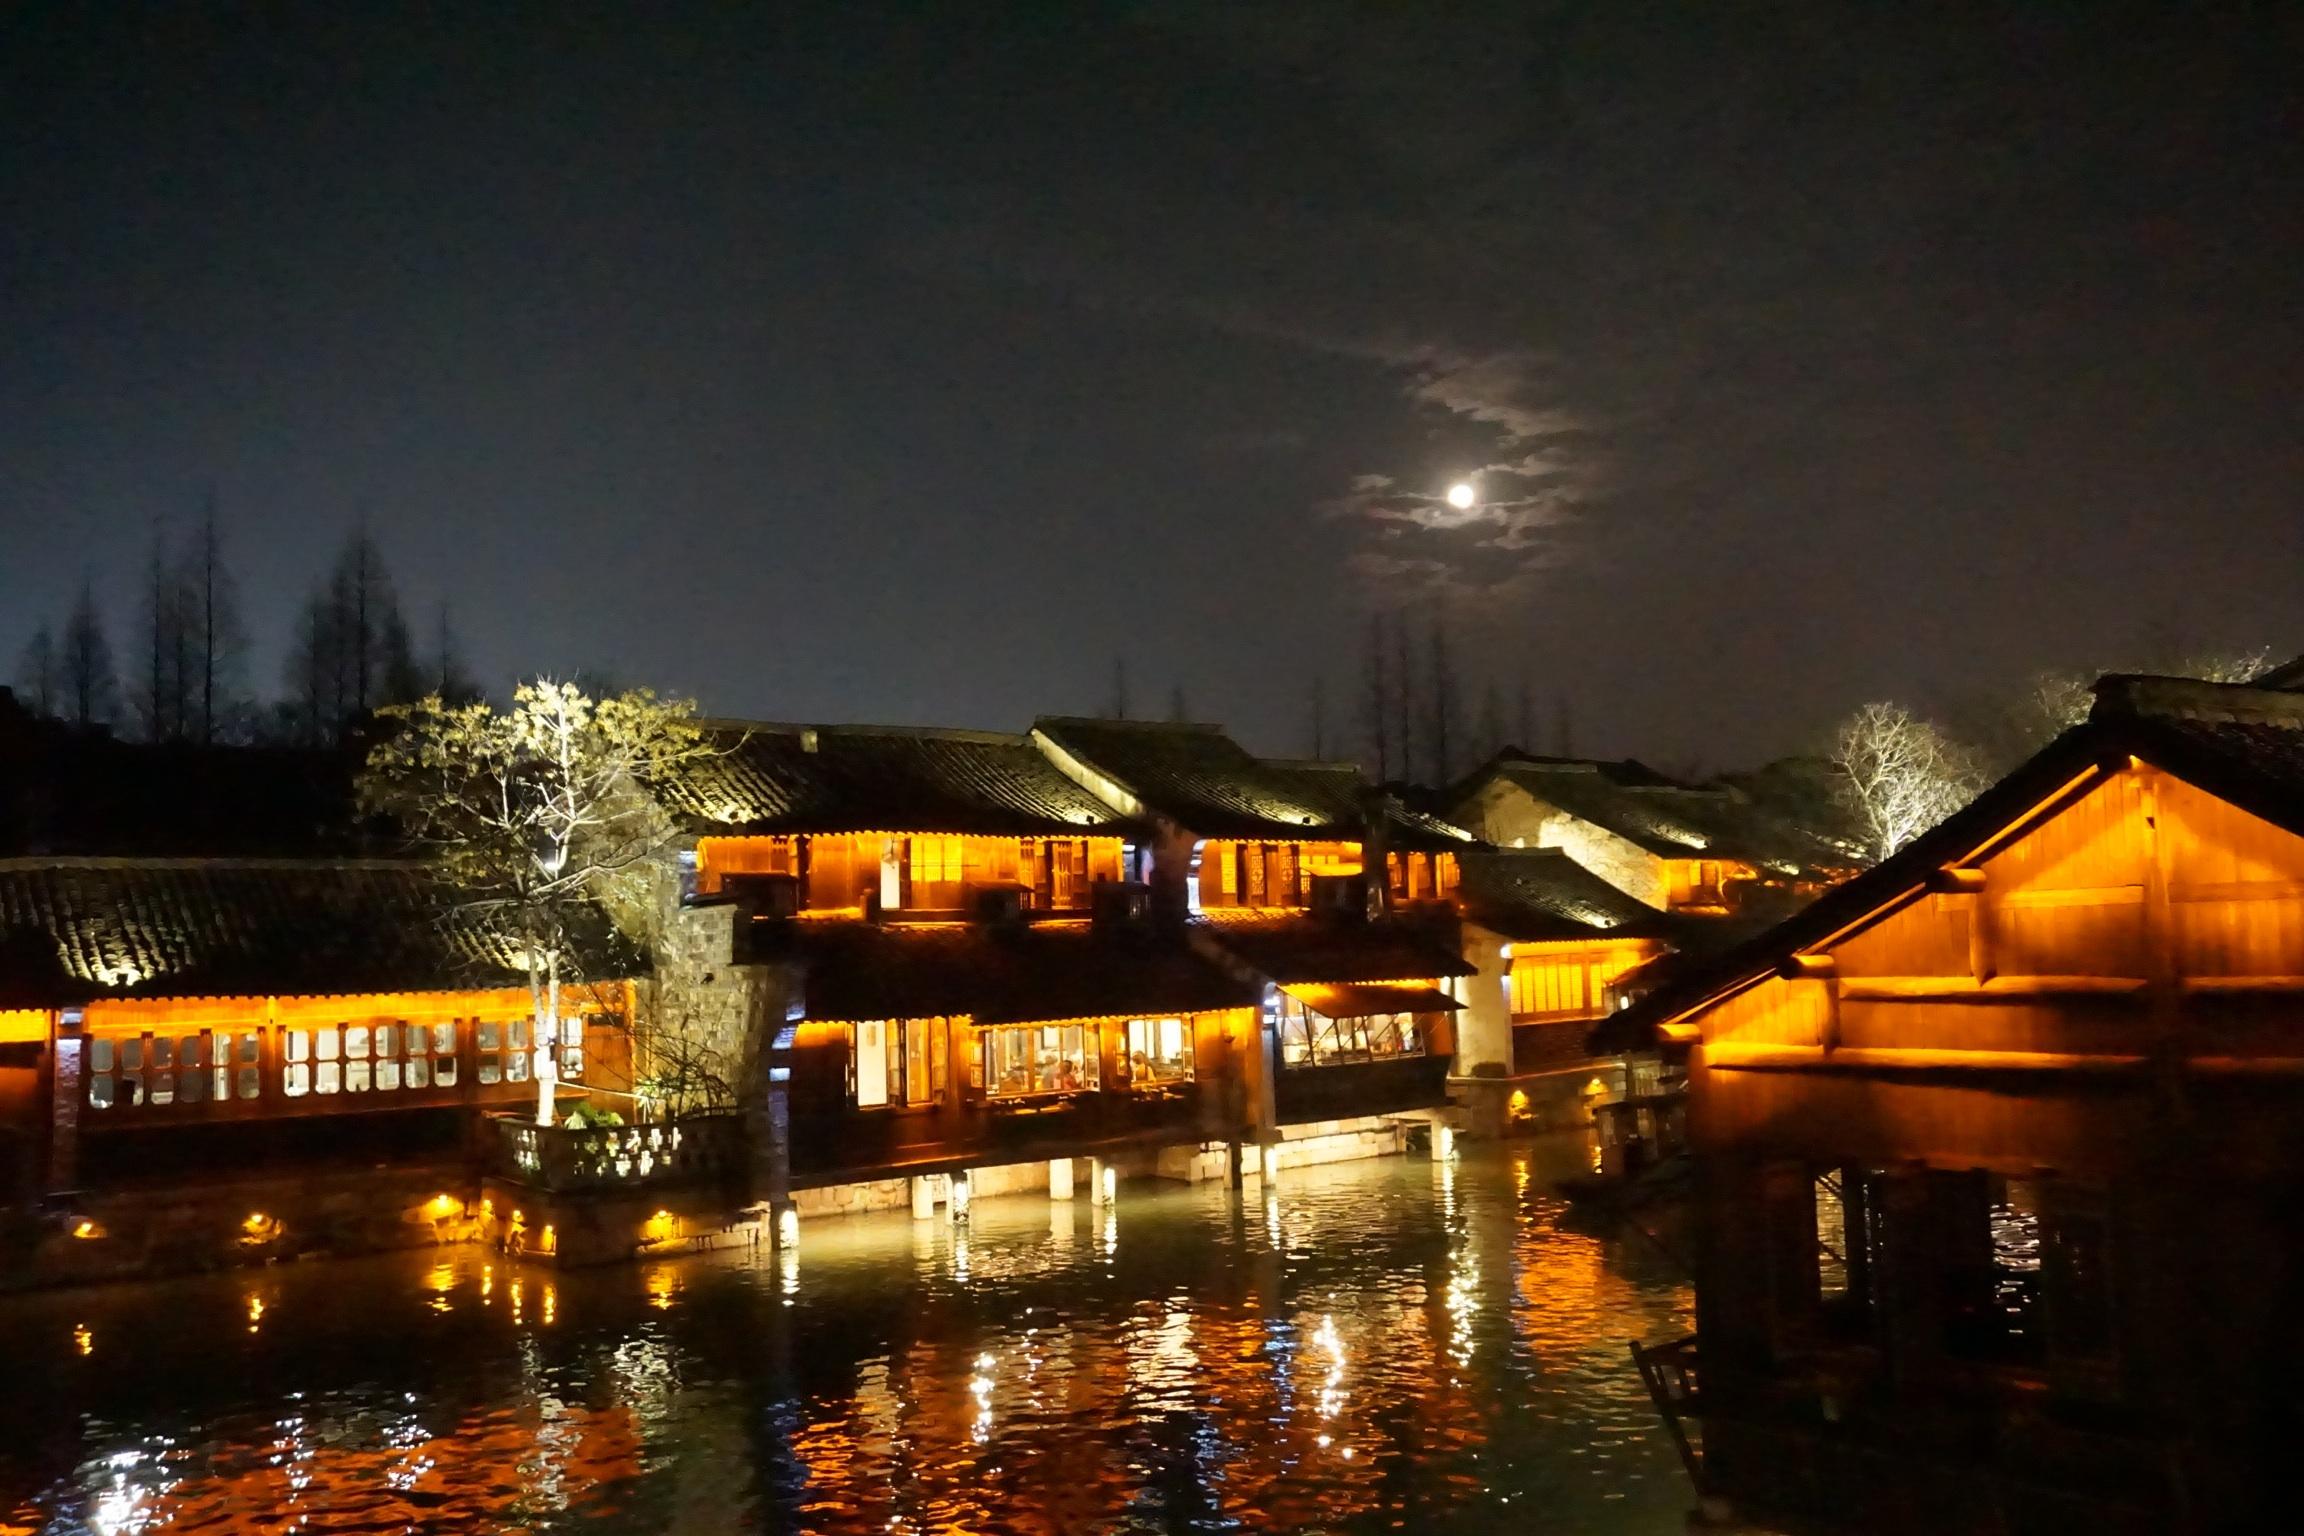 Chinese city at night